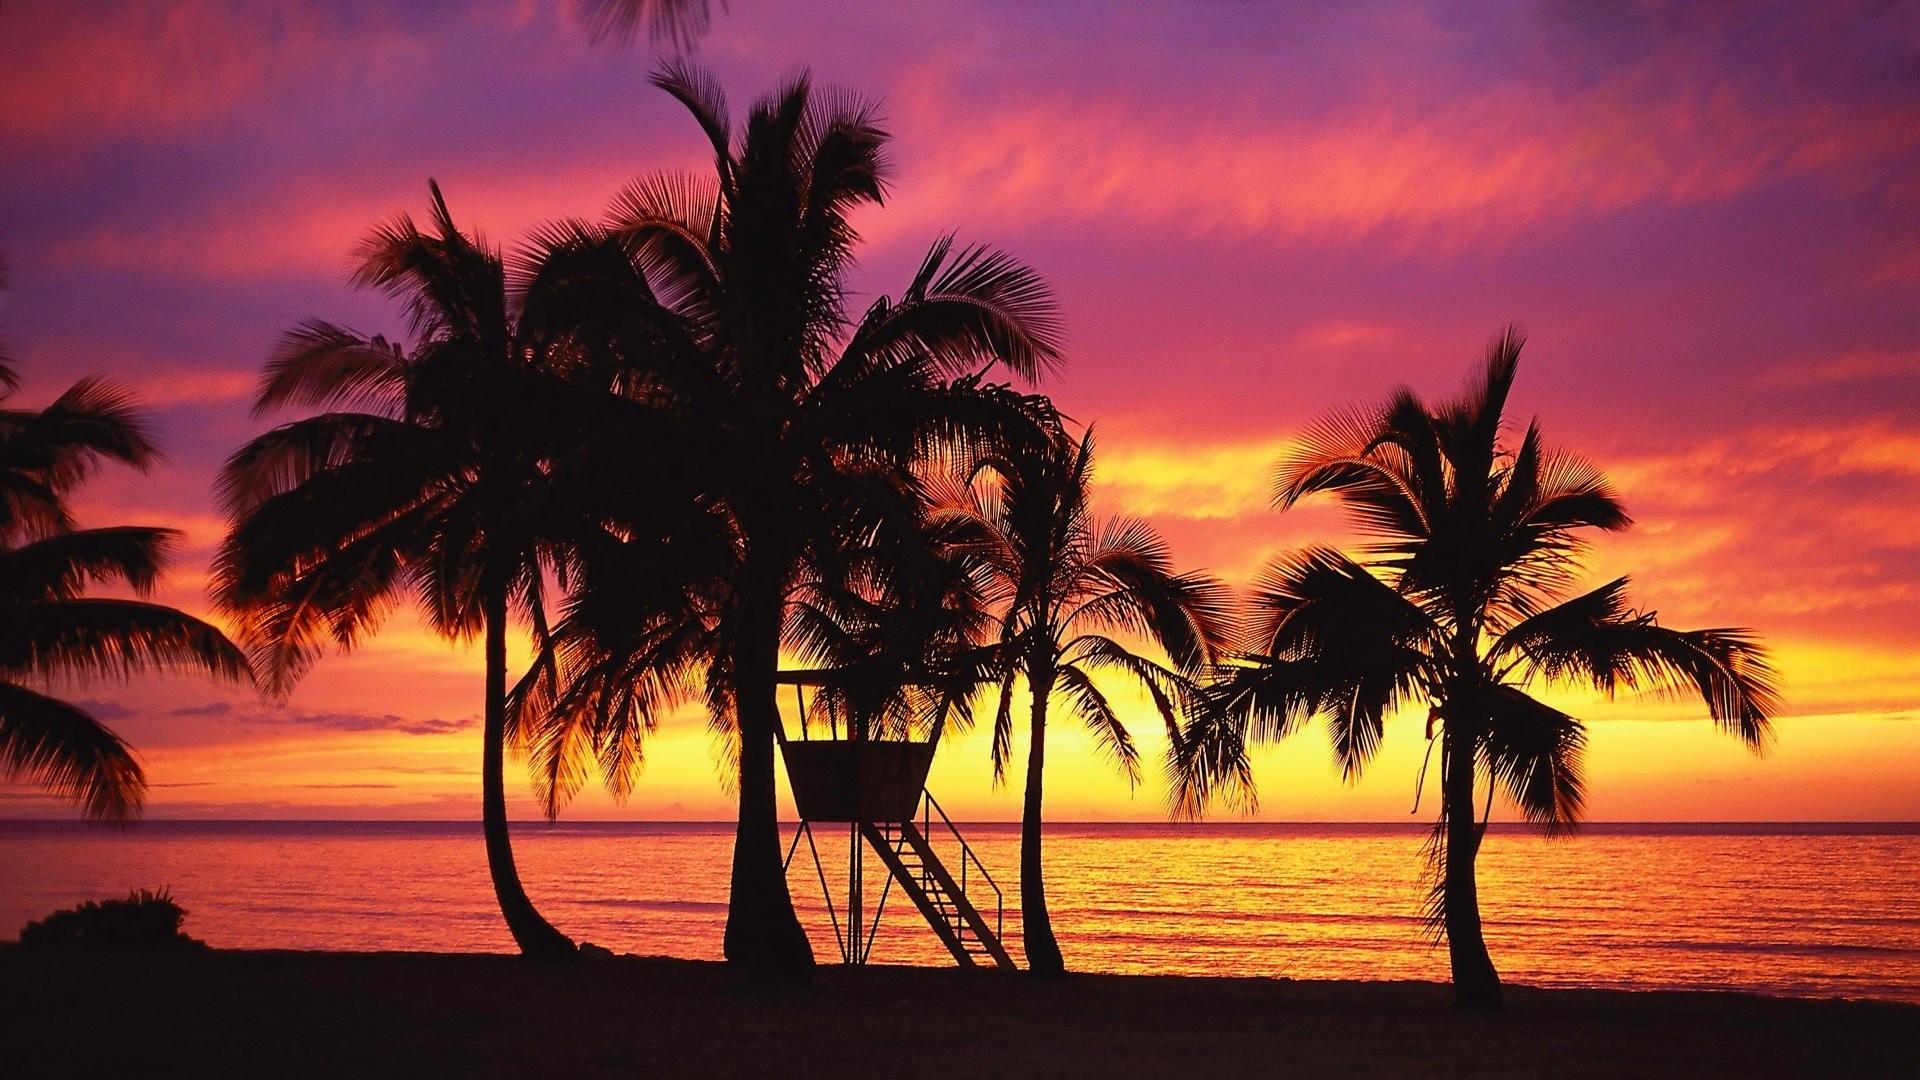 Hawaii Desktop Backgrounds 63 Images